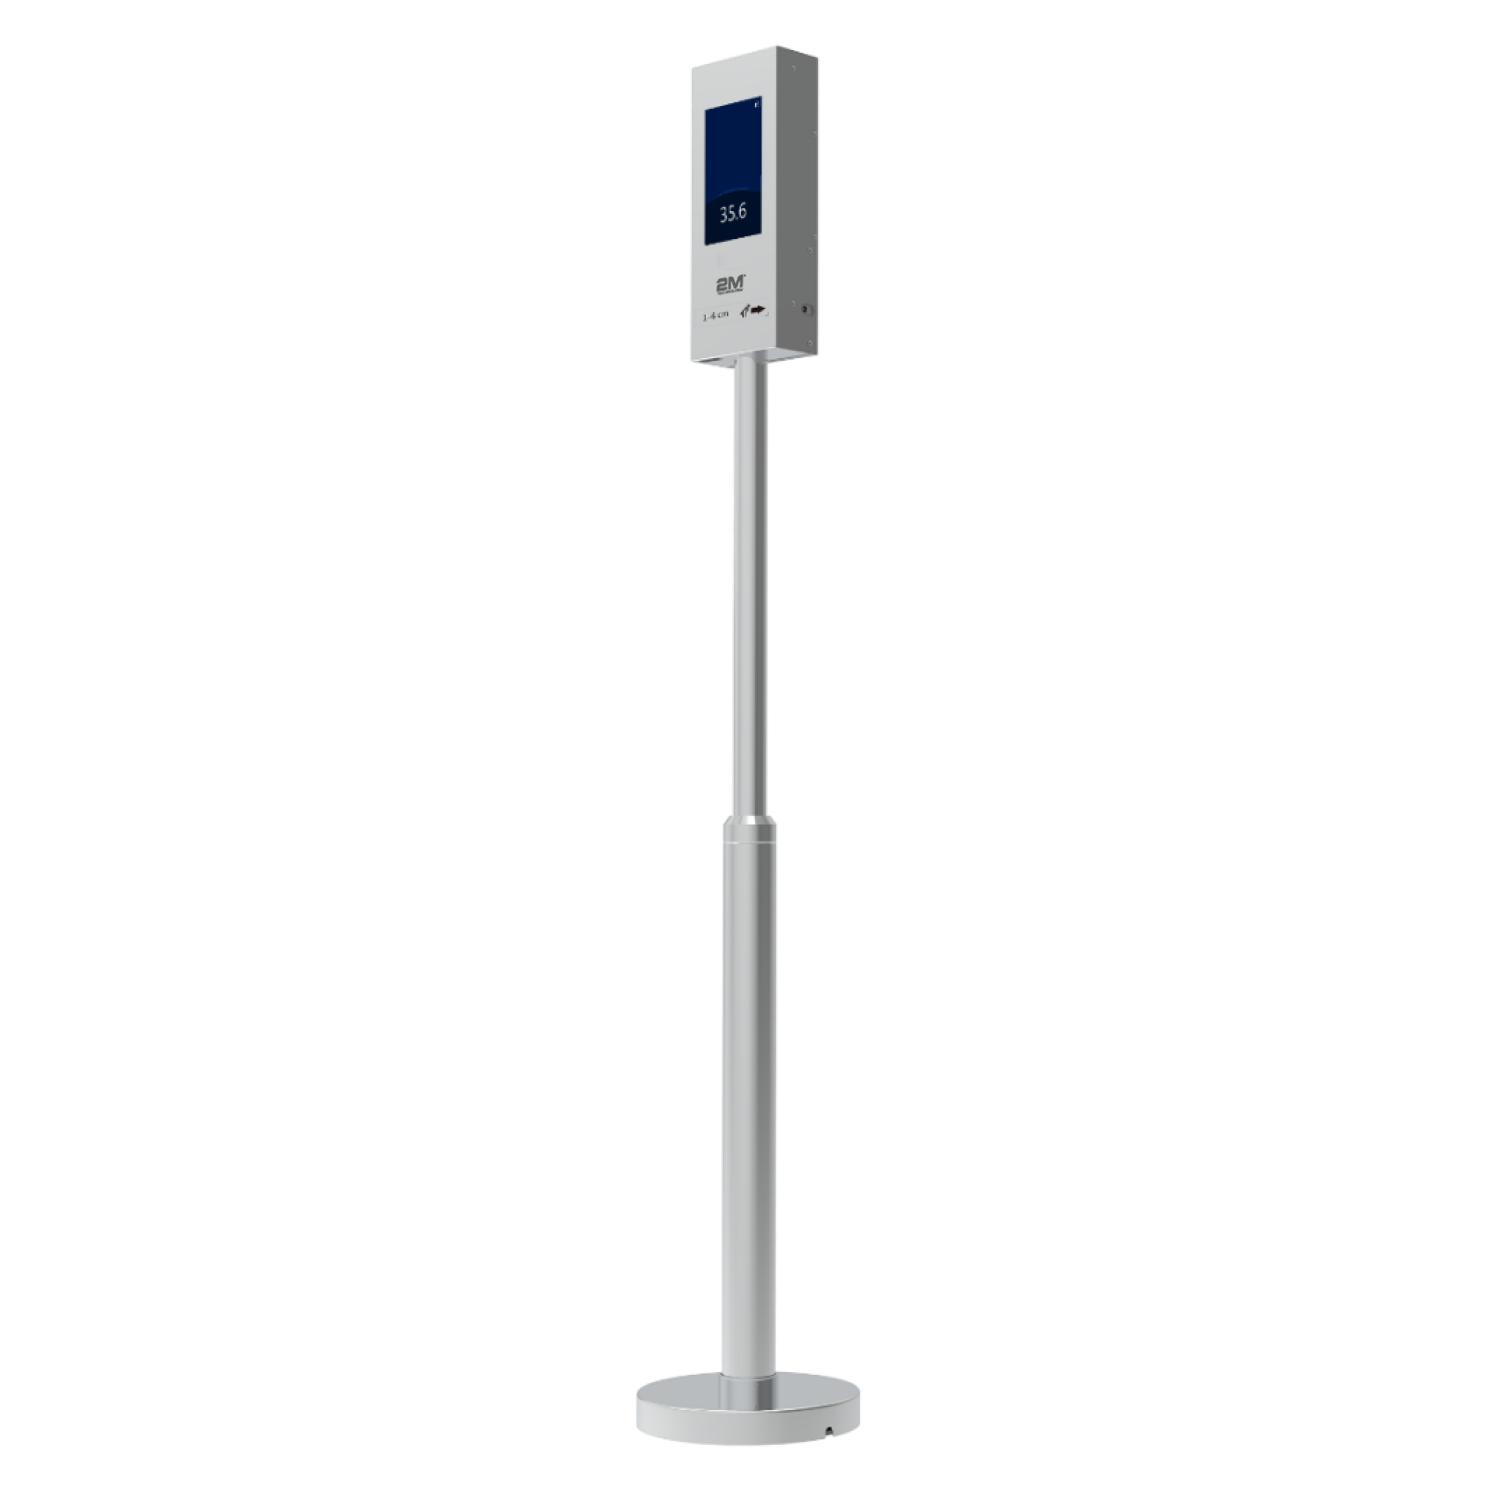 2MITD-2 Standing Human Body Temperature Screening System